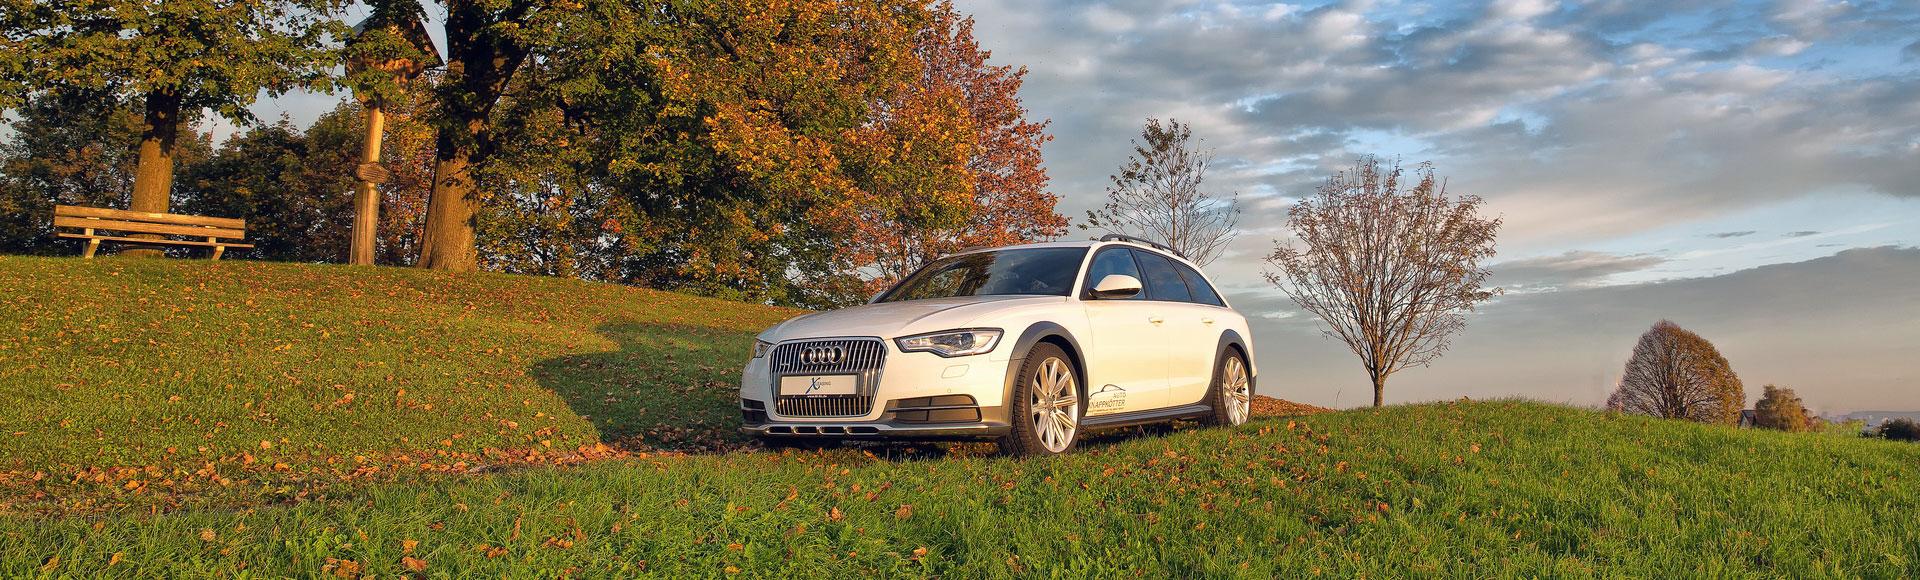 Audi A6 Allroad 2014 Herbst 3745